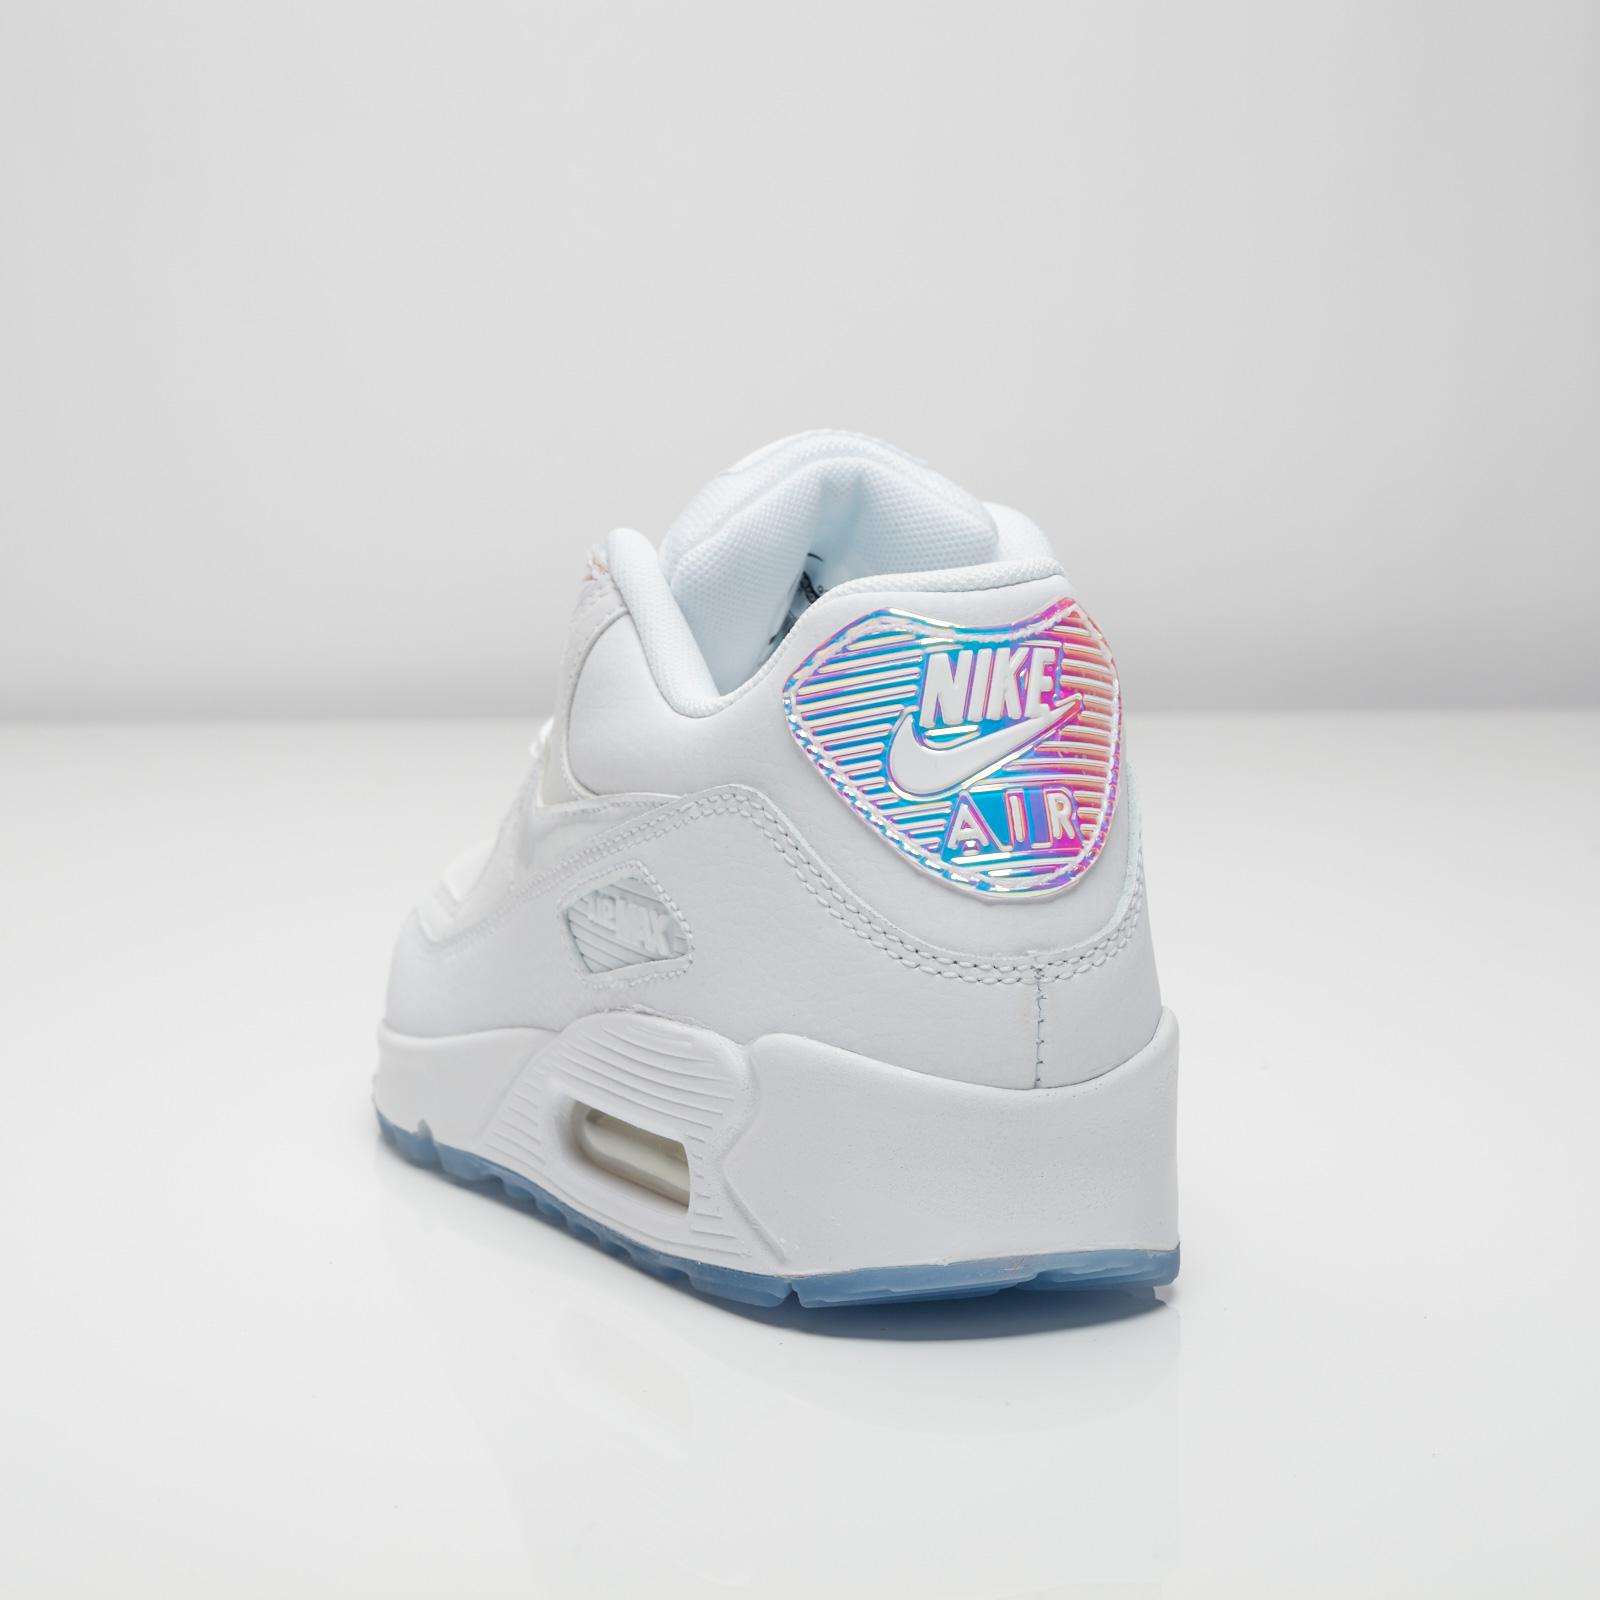 Nike Wmns Air Max 90 Premium 443817 104 Sneakersnstuff I